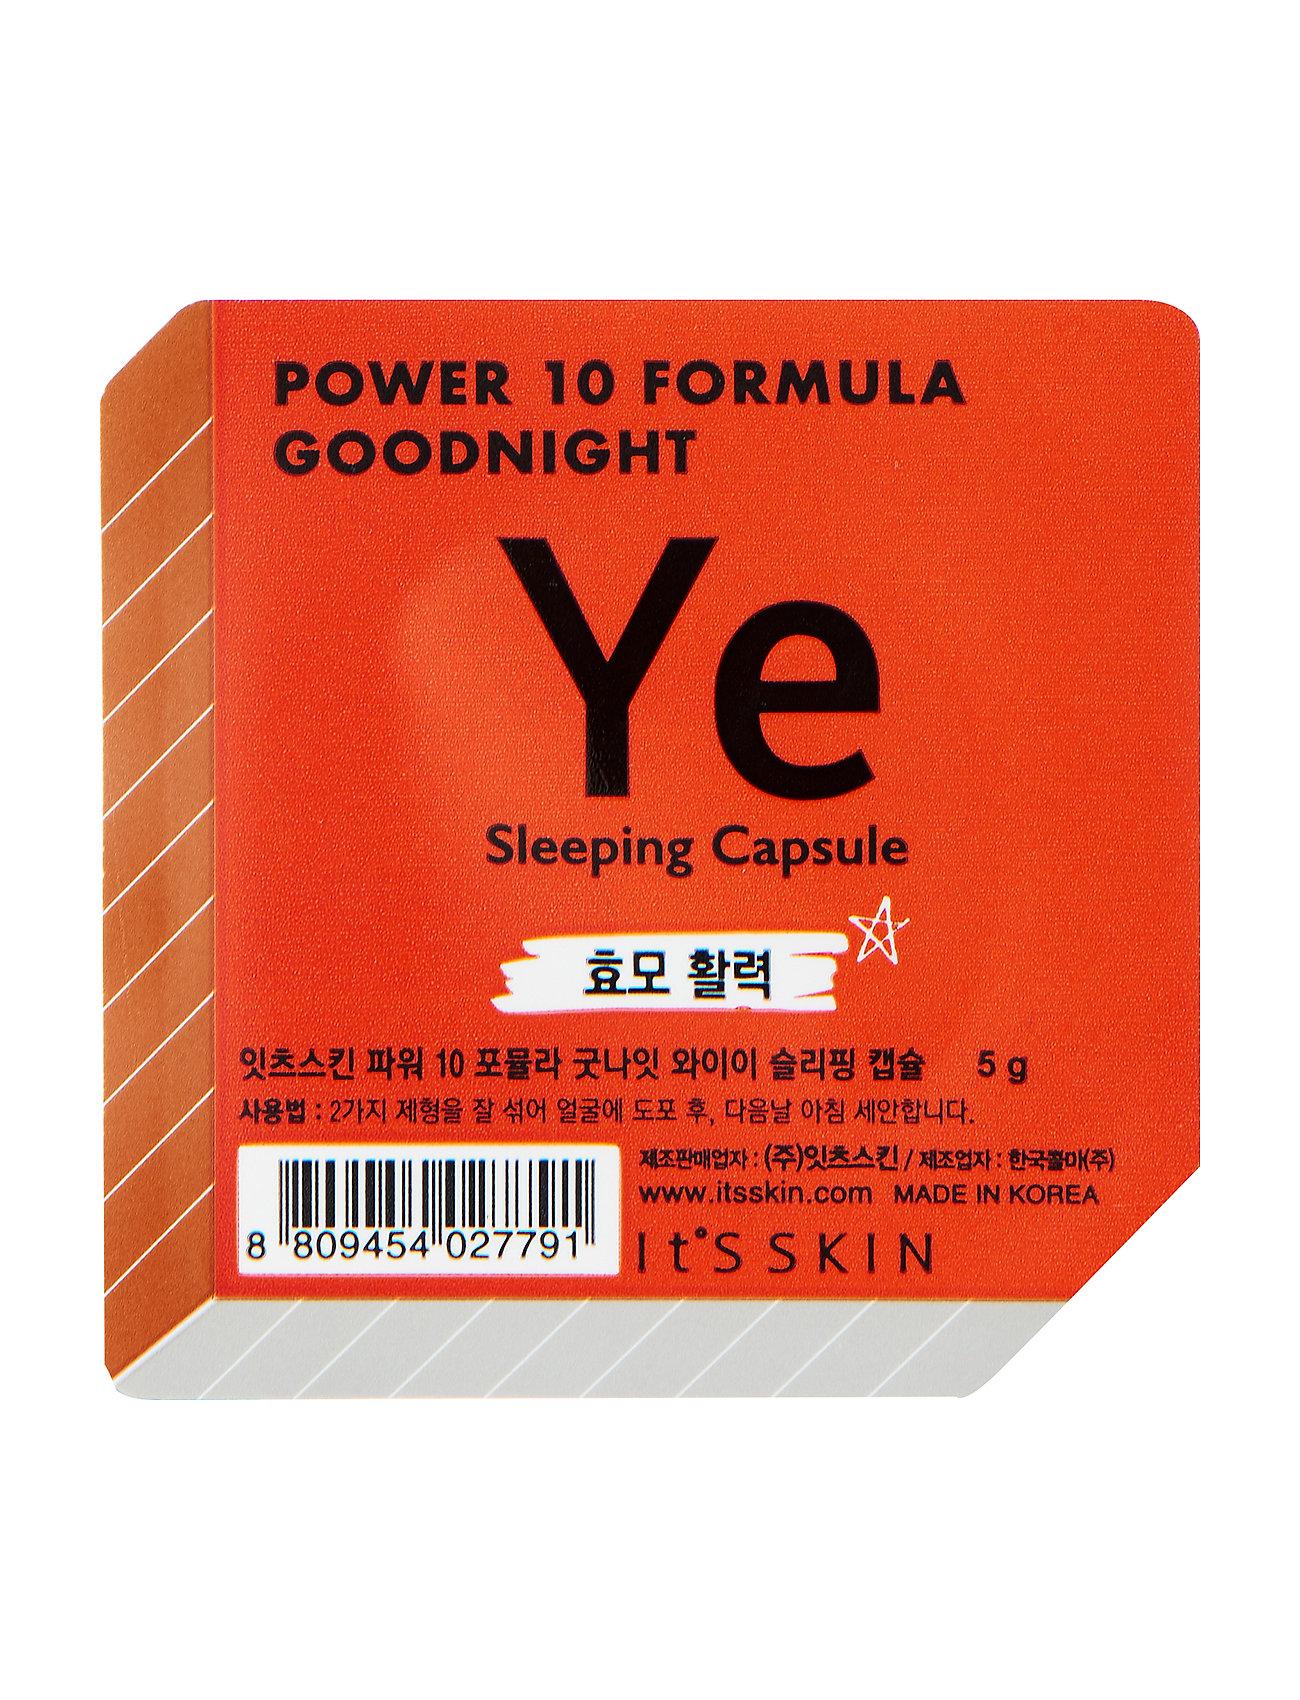 Image of It'S Skin Formula Goodnight Sleeping Capsule Ye Beauty WOMEN Skin Care Face Moisturizers Night Cream Nude It'S SKIN (3158644433)